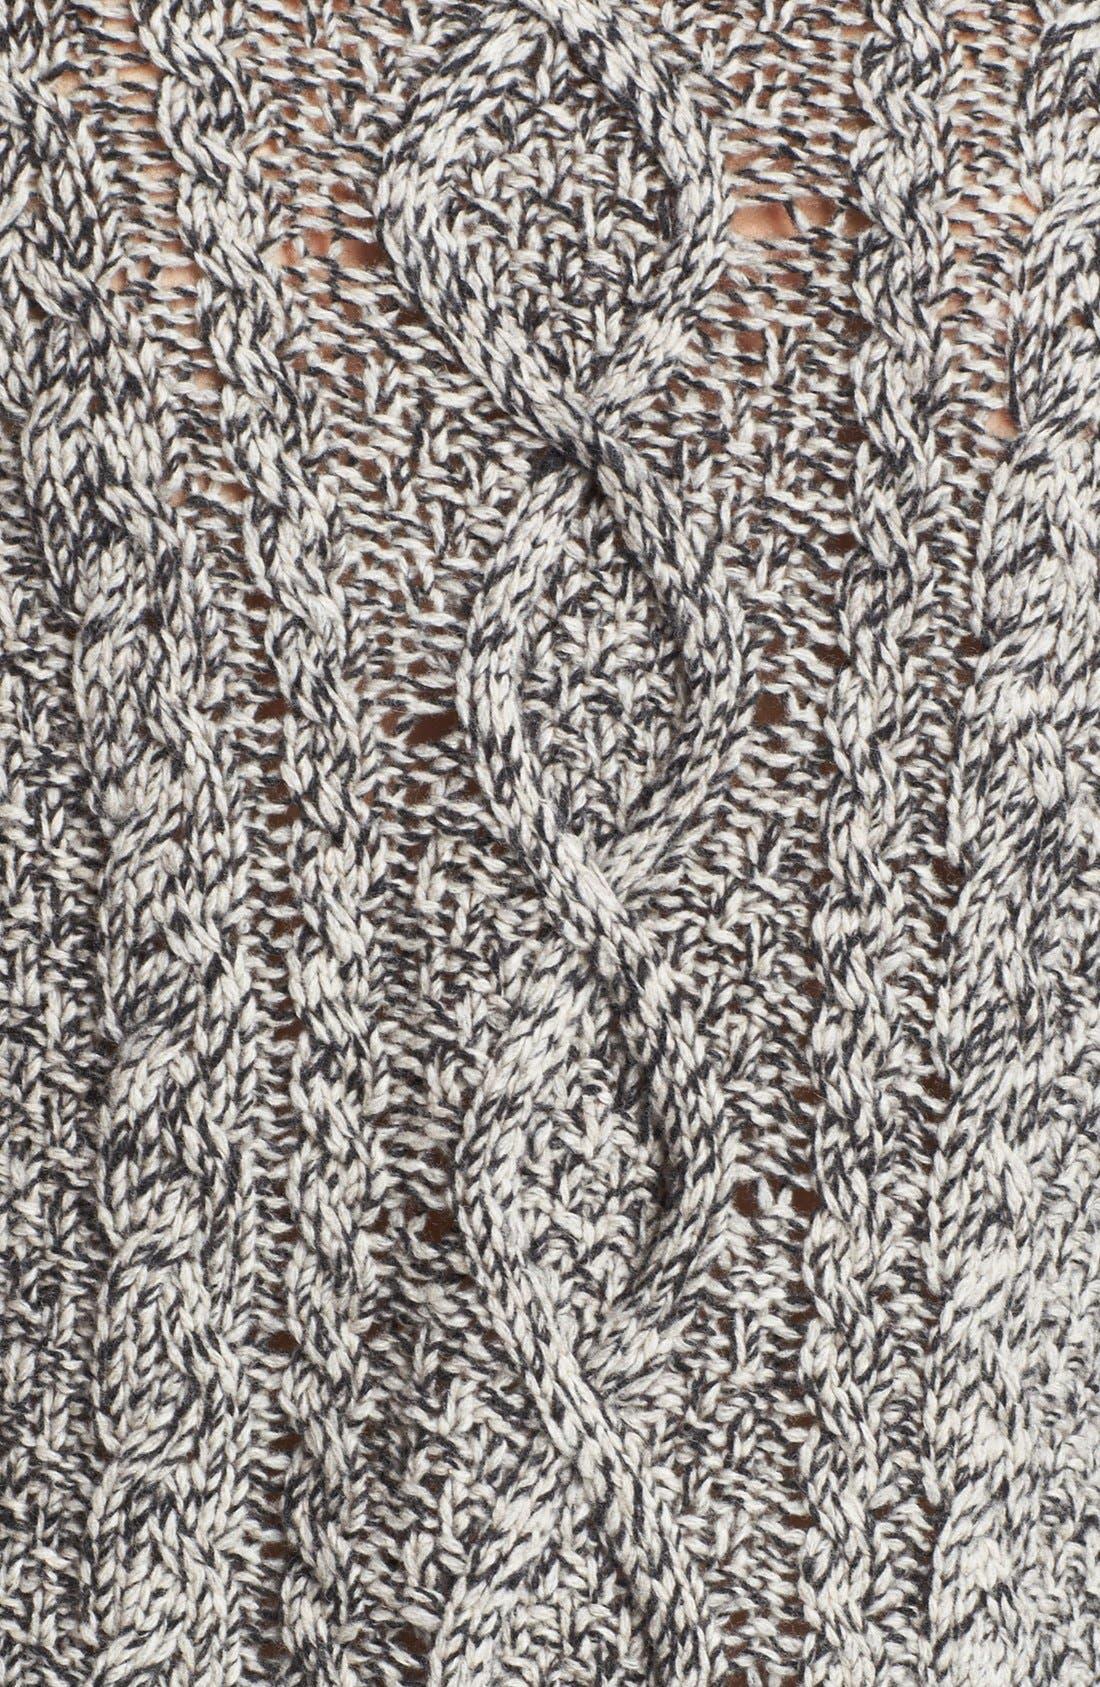 Colorblock Turtleneck Sweater,                             Alternate thumbnail 3, color,                             020